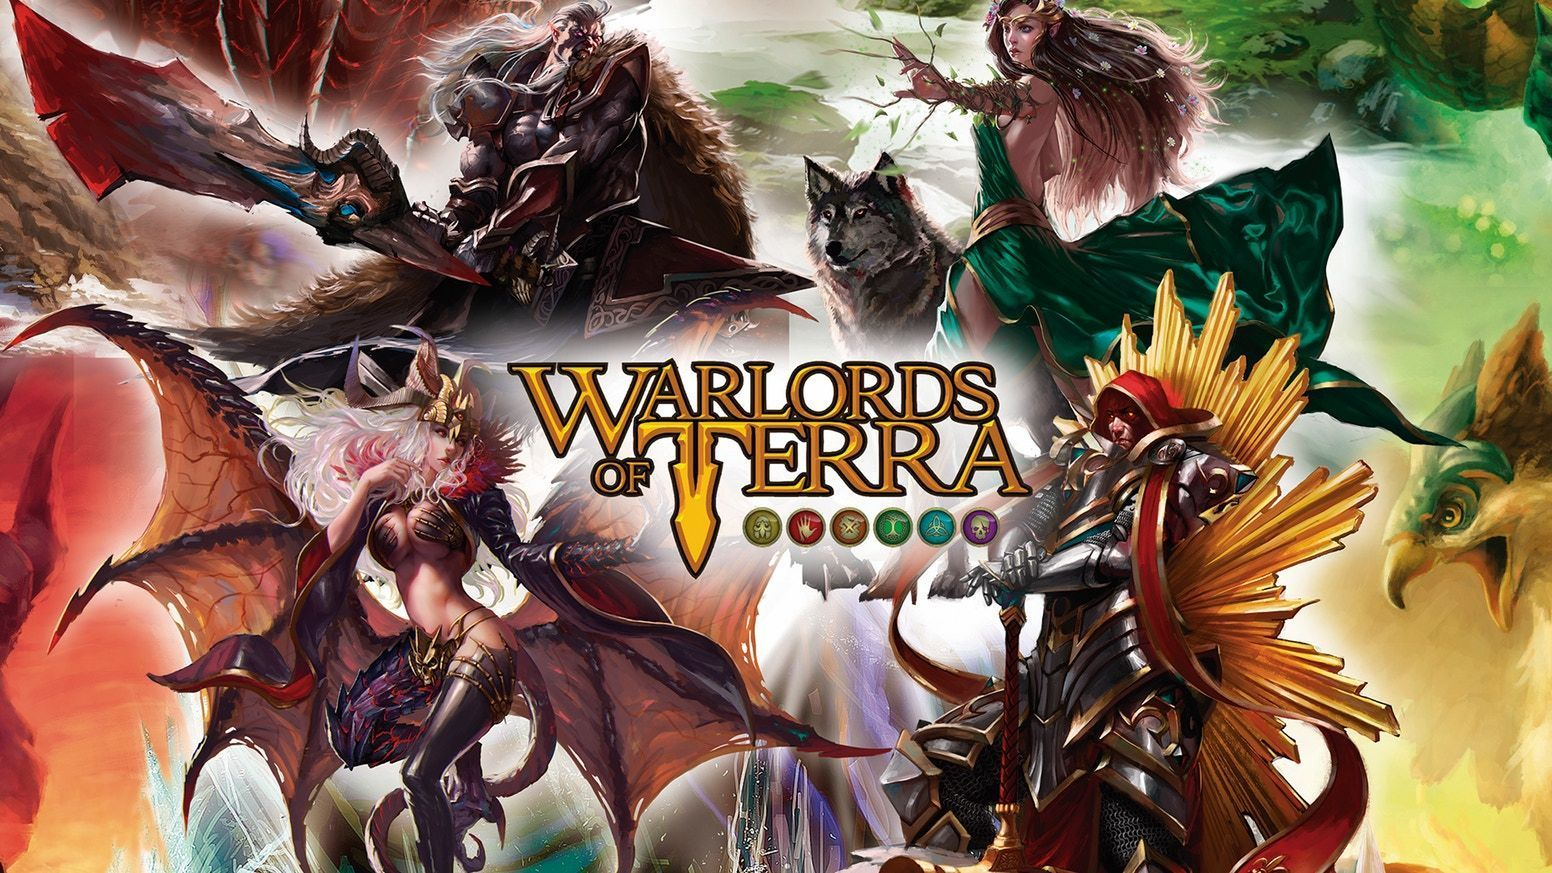 Reseña de Warlords of Terra